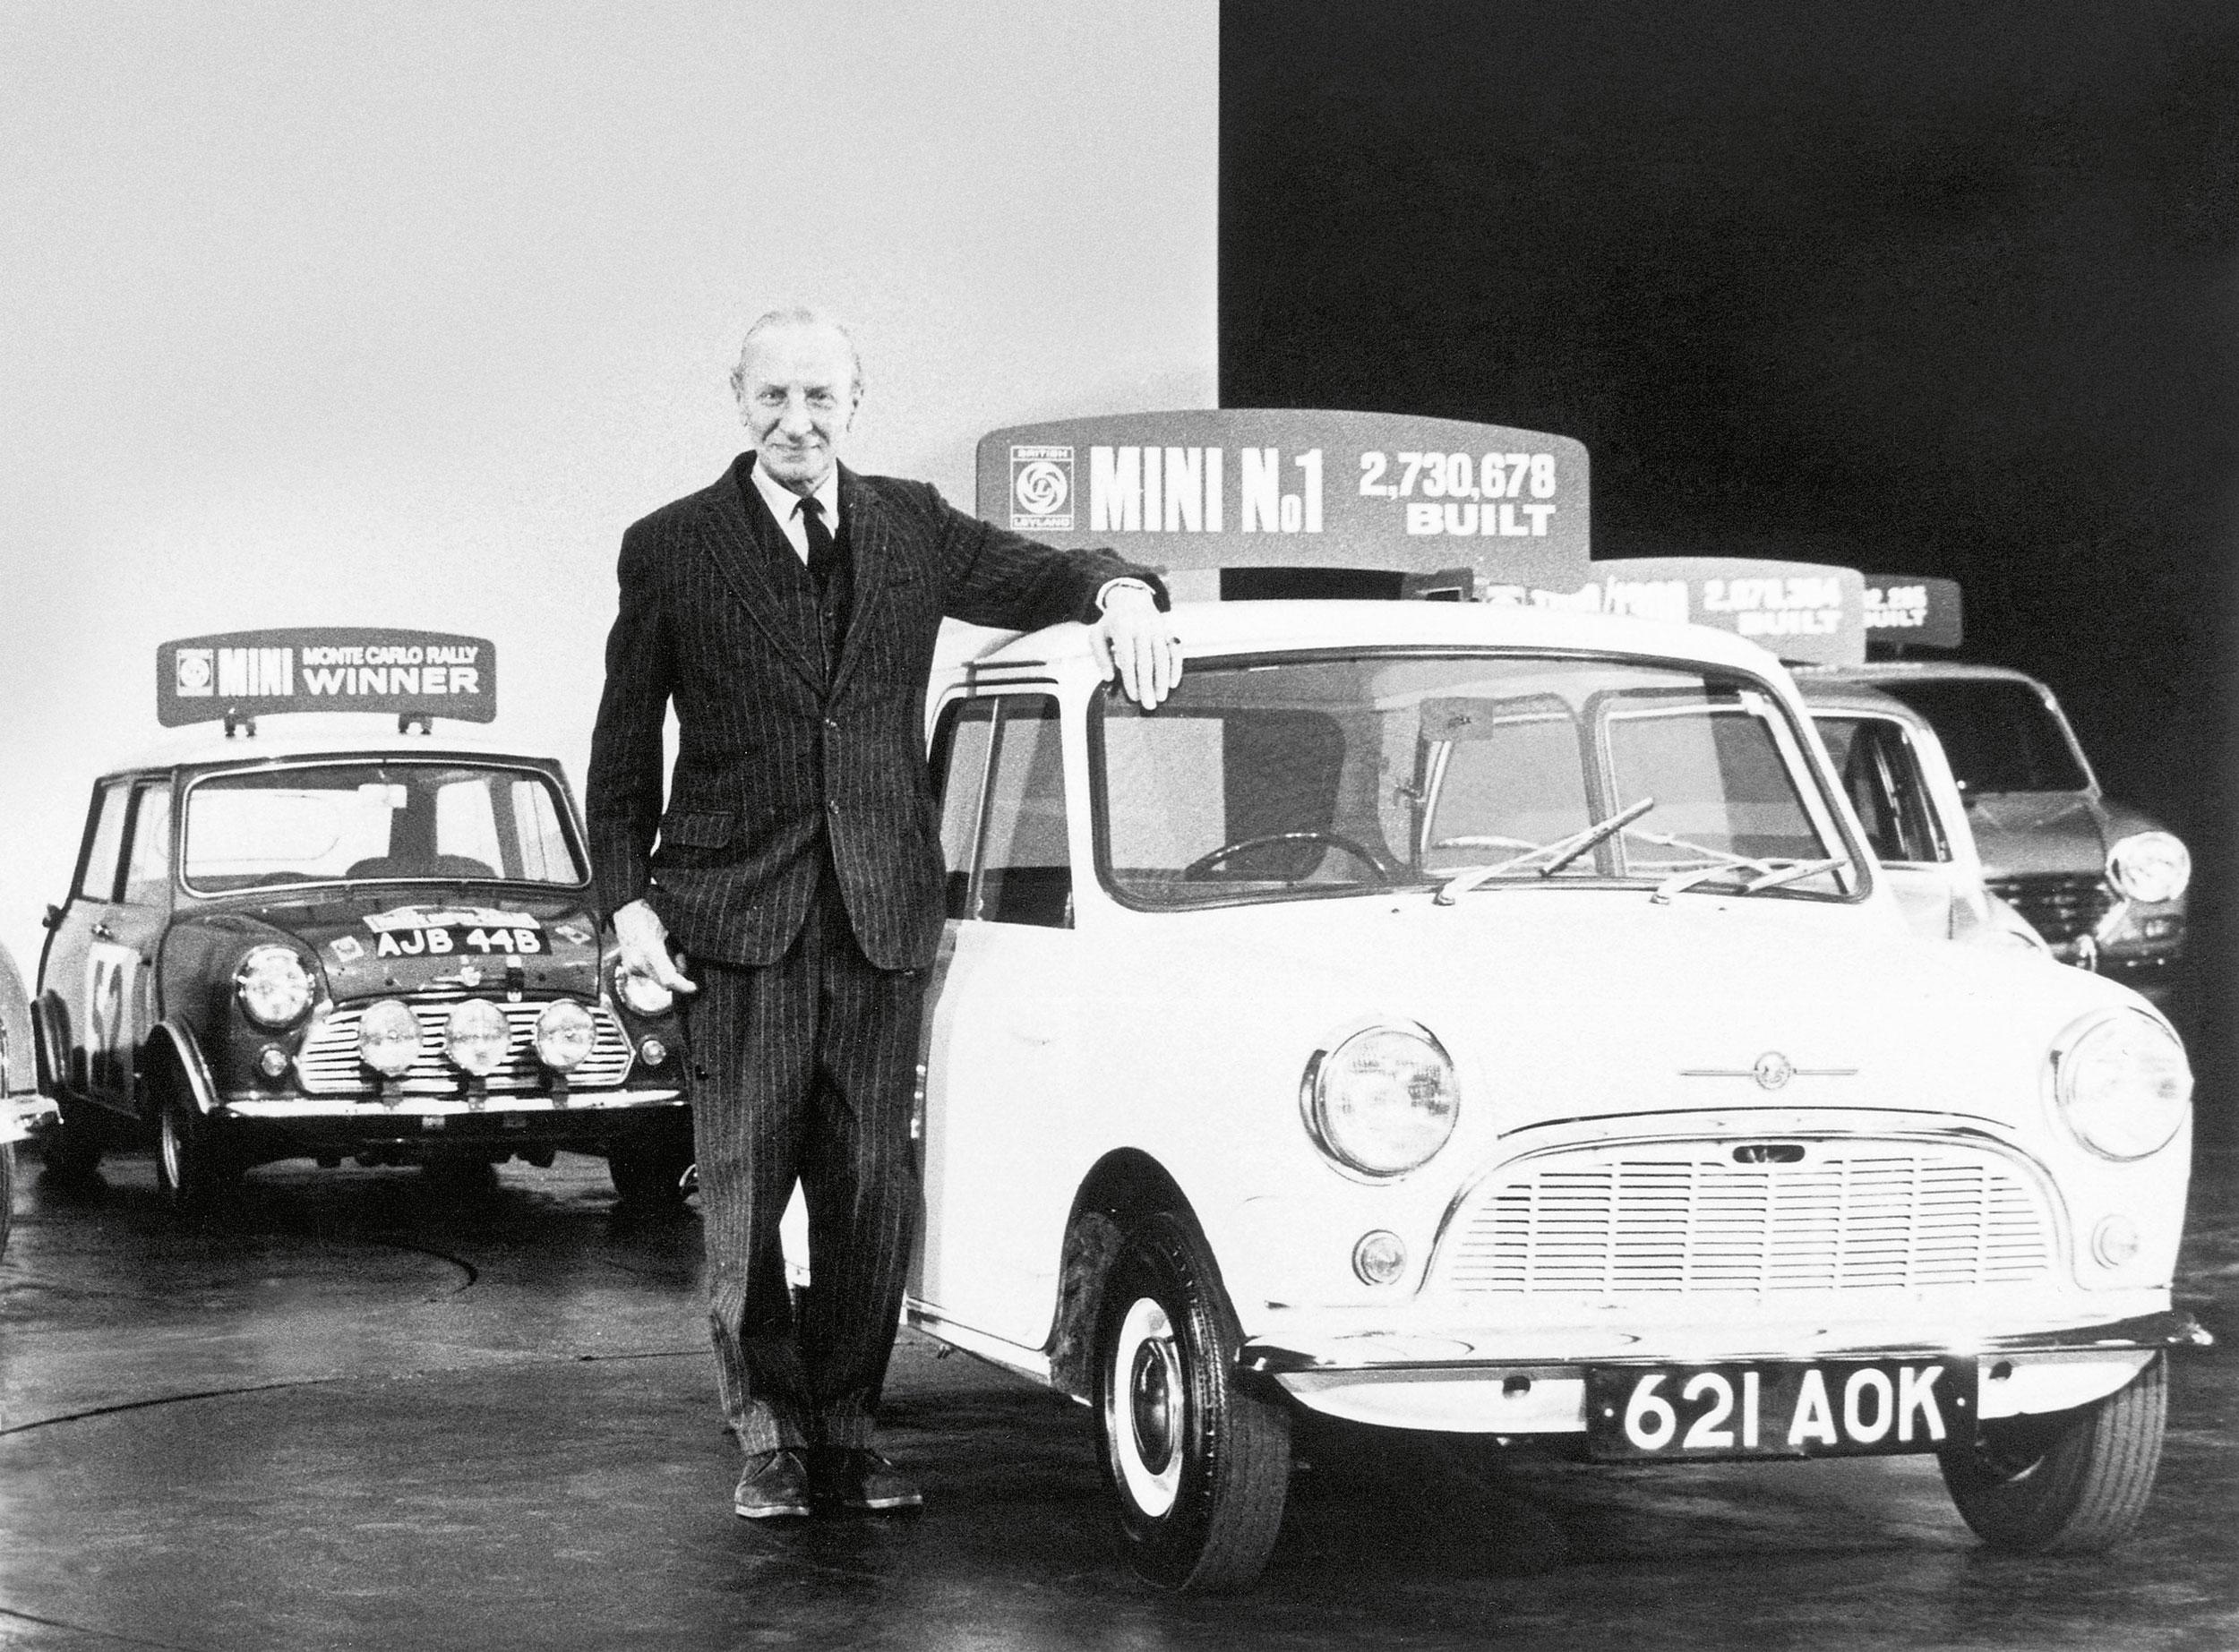 Sir Alex Issigonis standing next to a vintage Mini